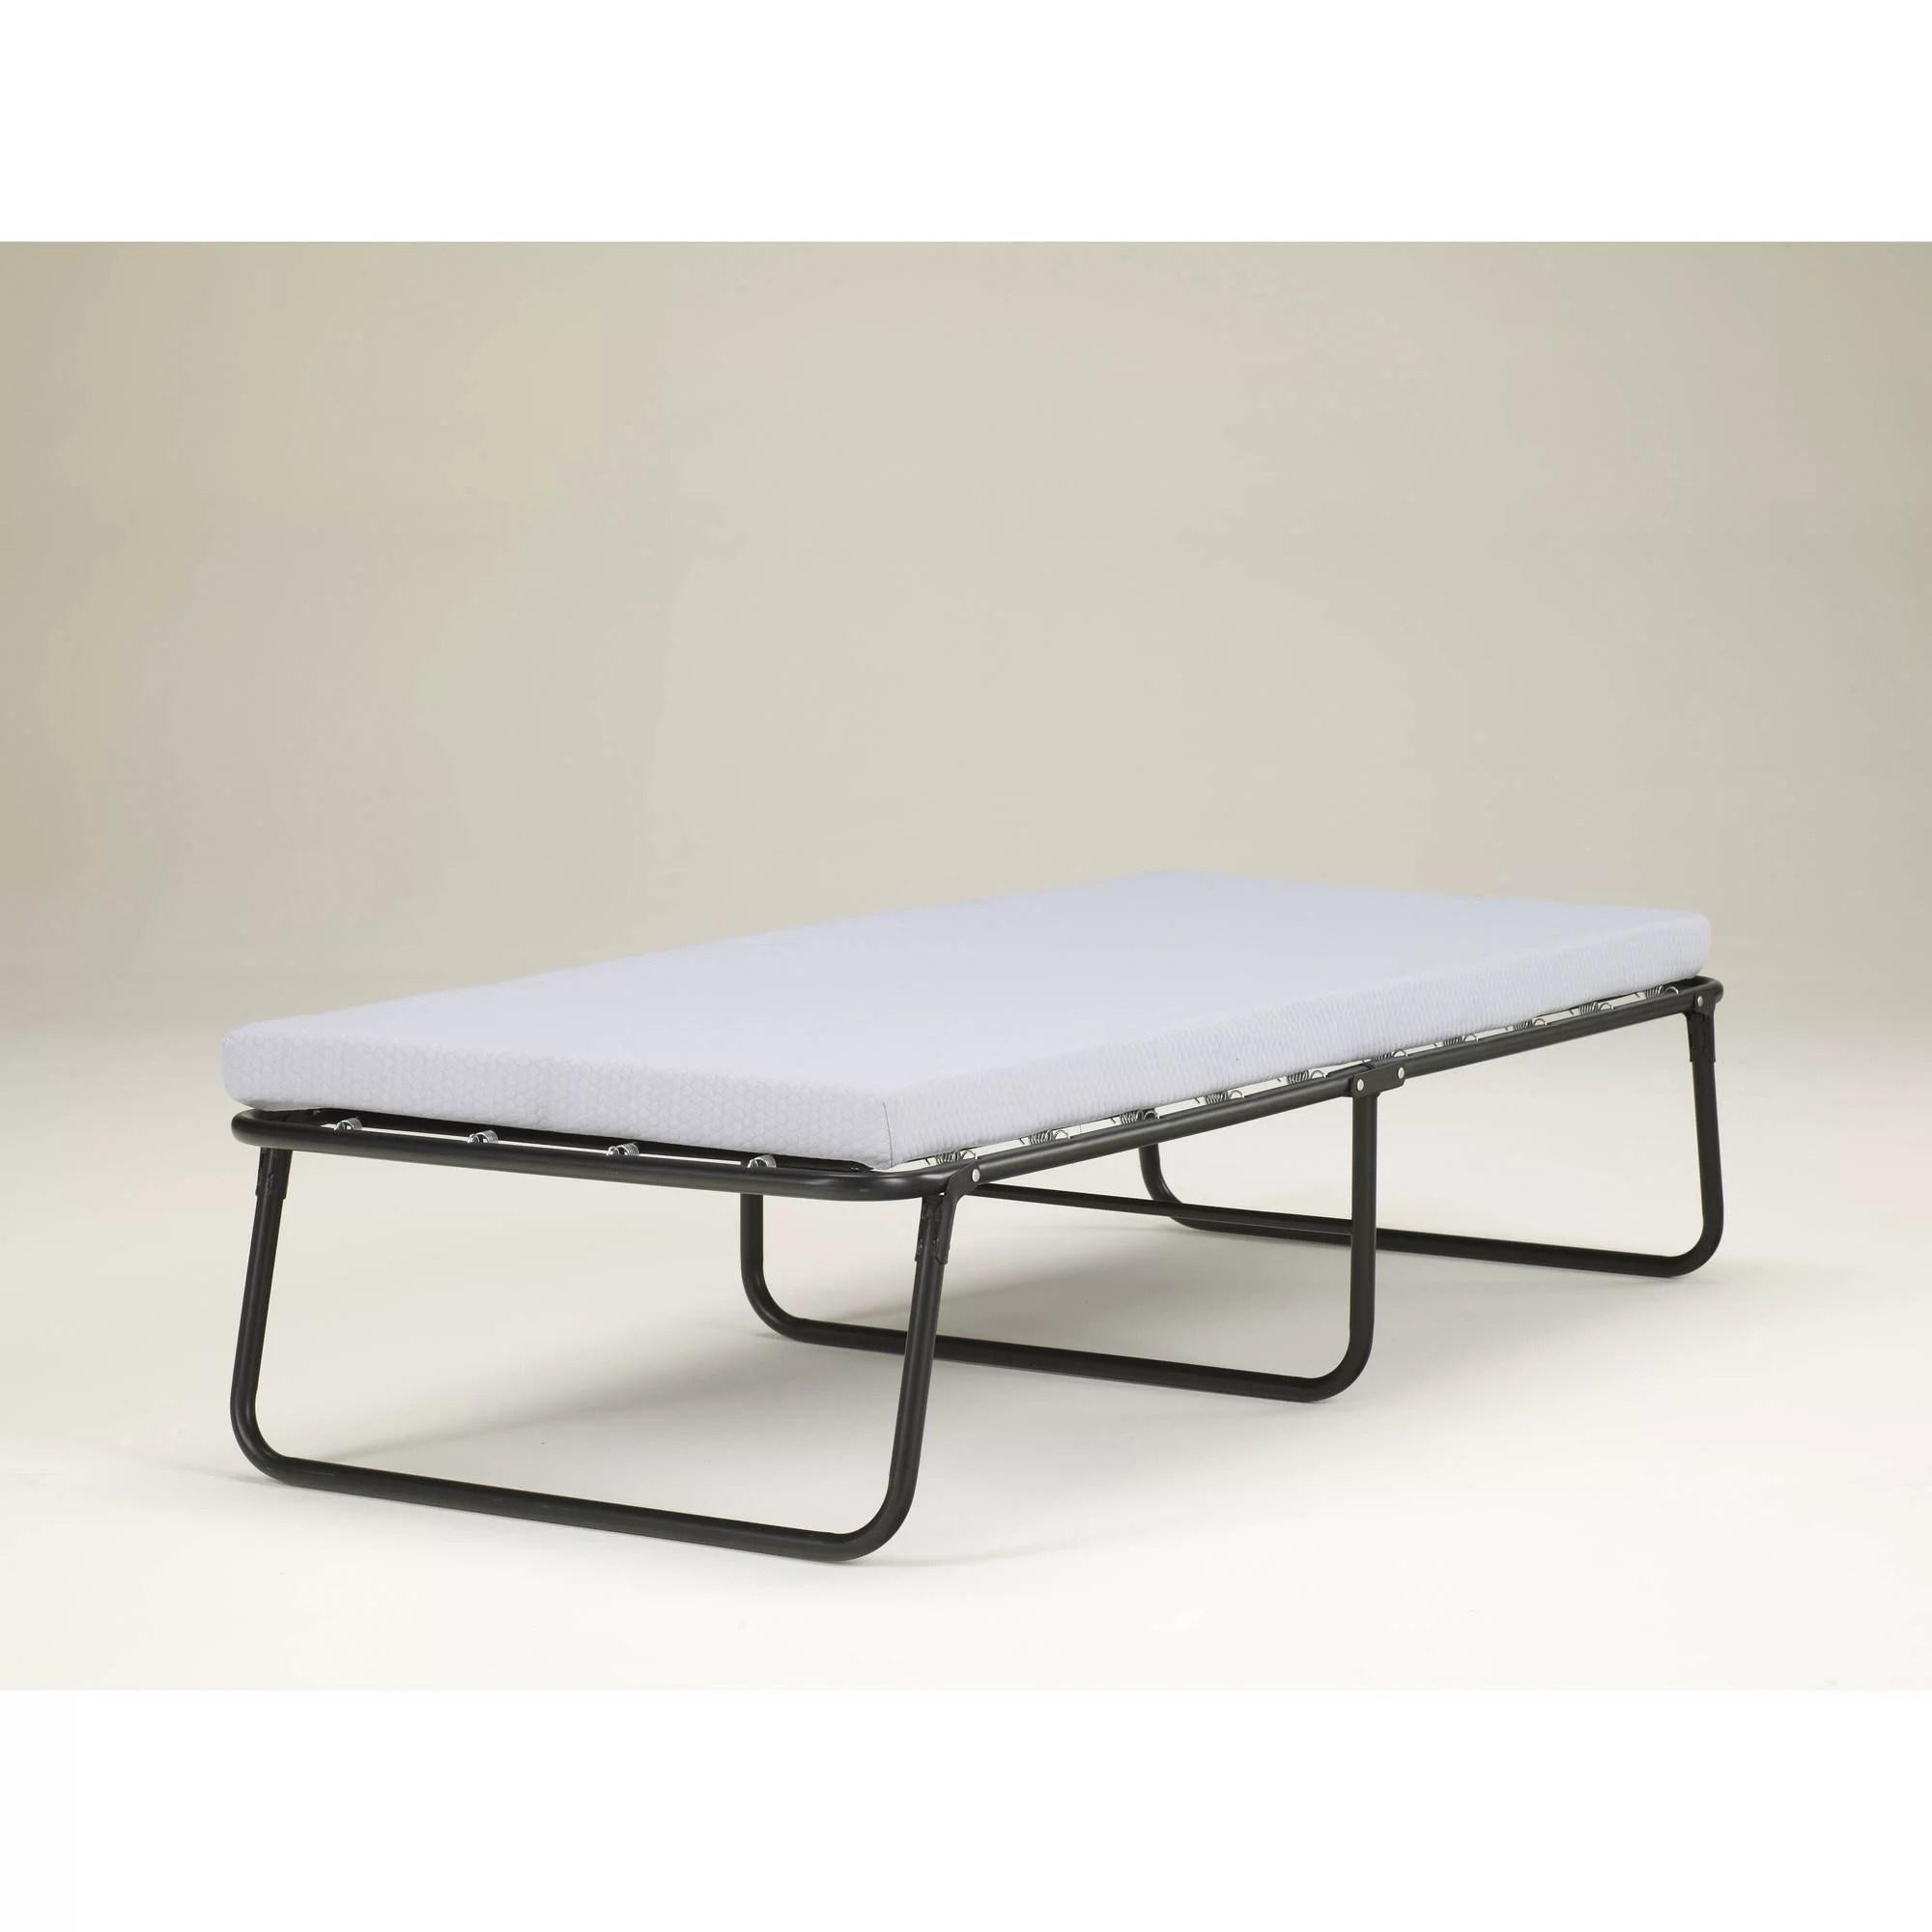 Simmons Beautysleep Folding Guest Bed With Springs And Memory Foam Mattress Twin Walmart Com Walmart Com